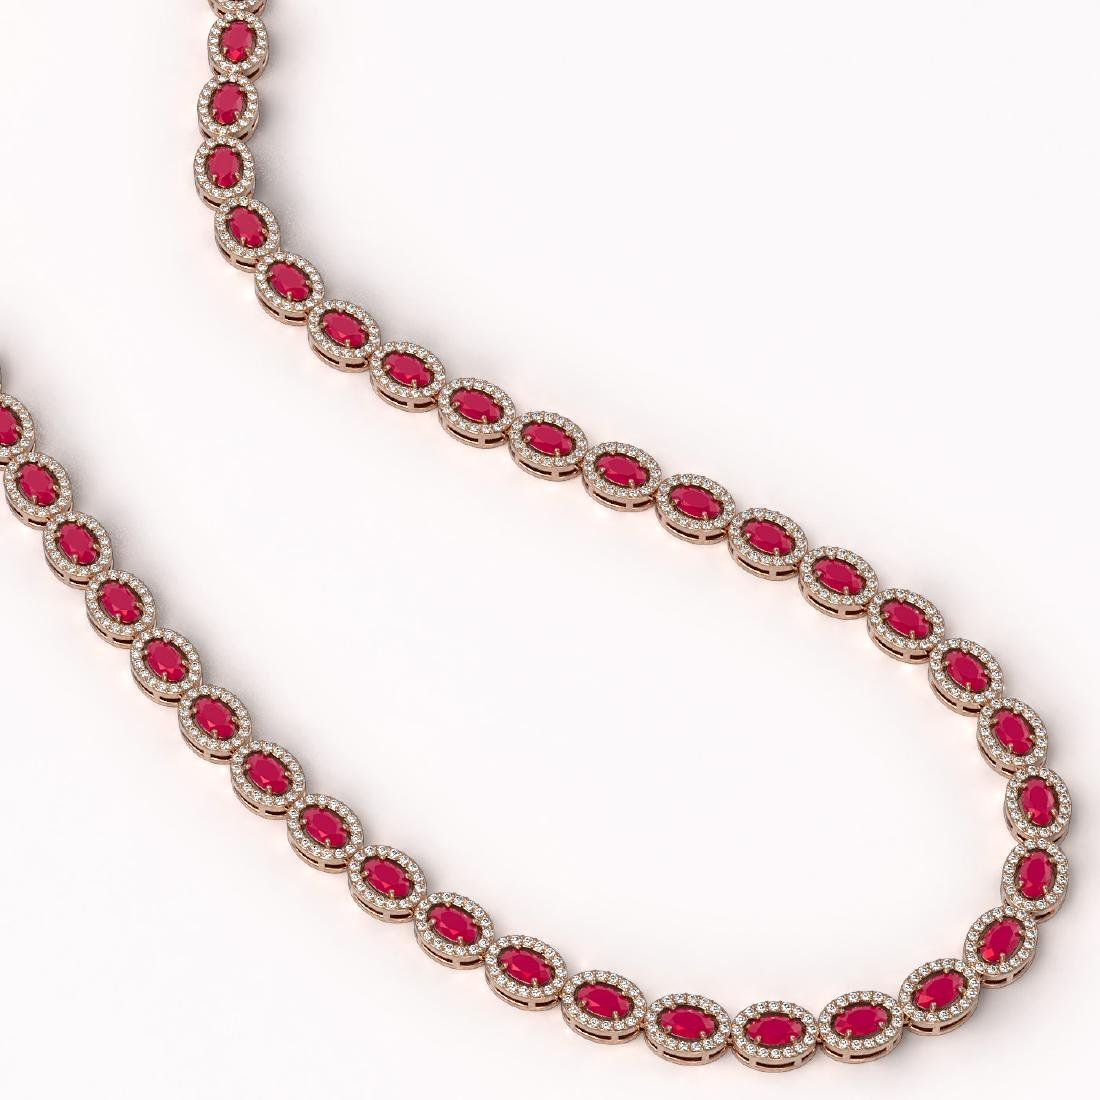 26.38 CTW Ruby & Diamond Halo Necklace 10K Rose Gold - 2